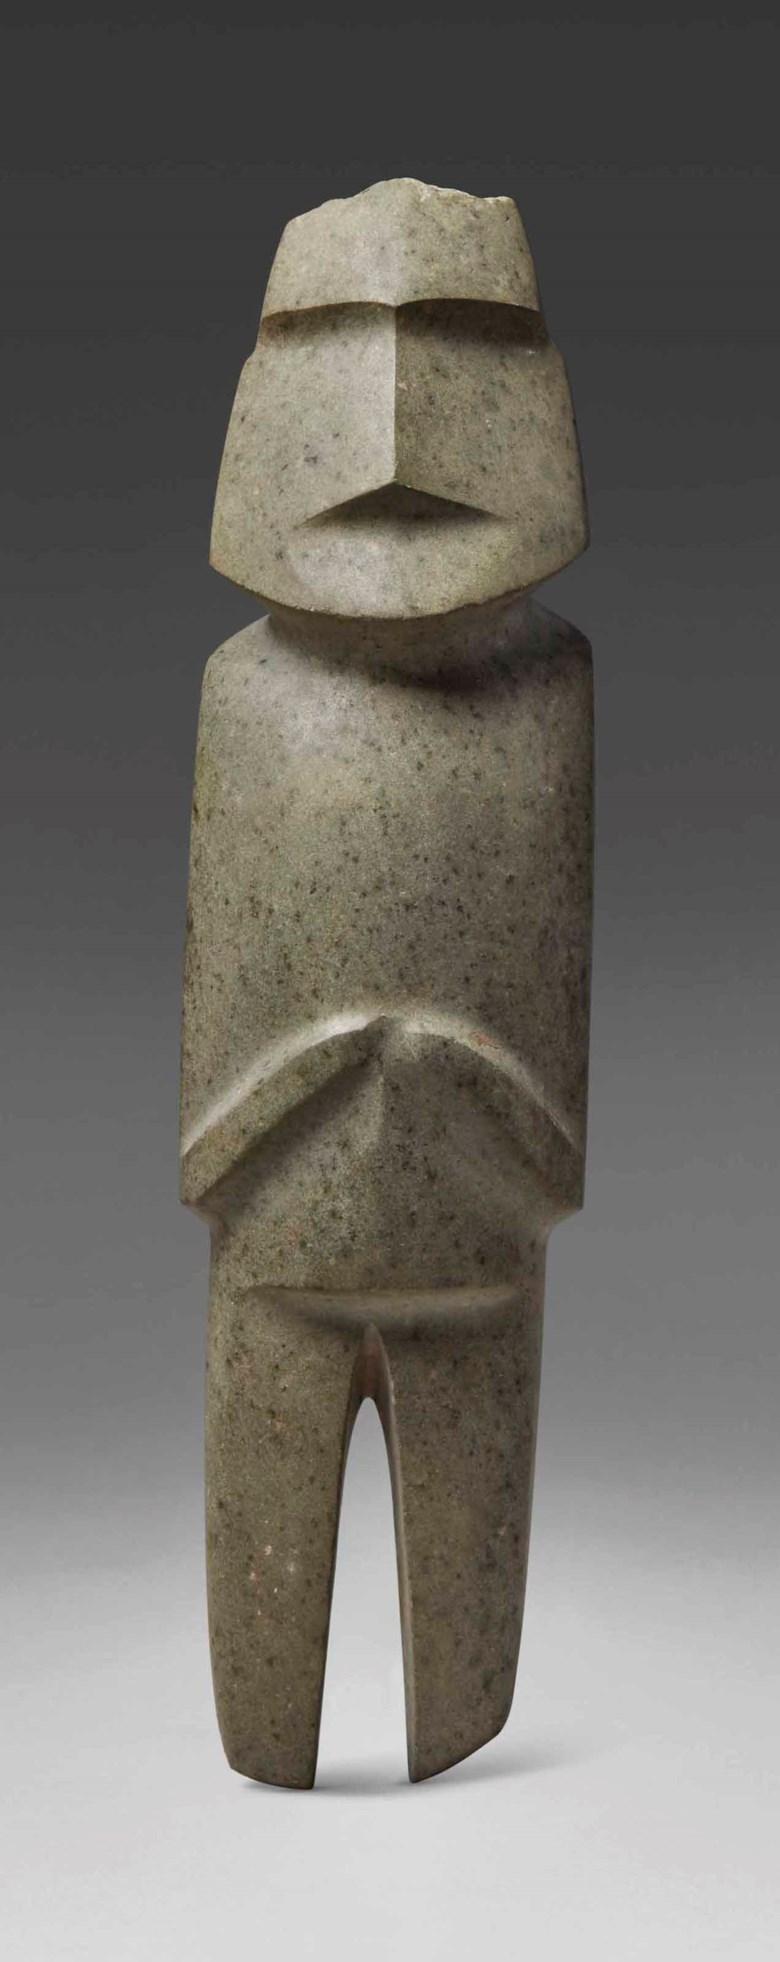 Imposing Mezcala stone figure, Type M10, Preclassic, circa 300-100 B.C.Height 33 cm (13  in). Sold for €439,500 in A Quantum of History The Prigogine Collectionon 9 April 2018  at Christie's in Paris